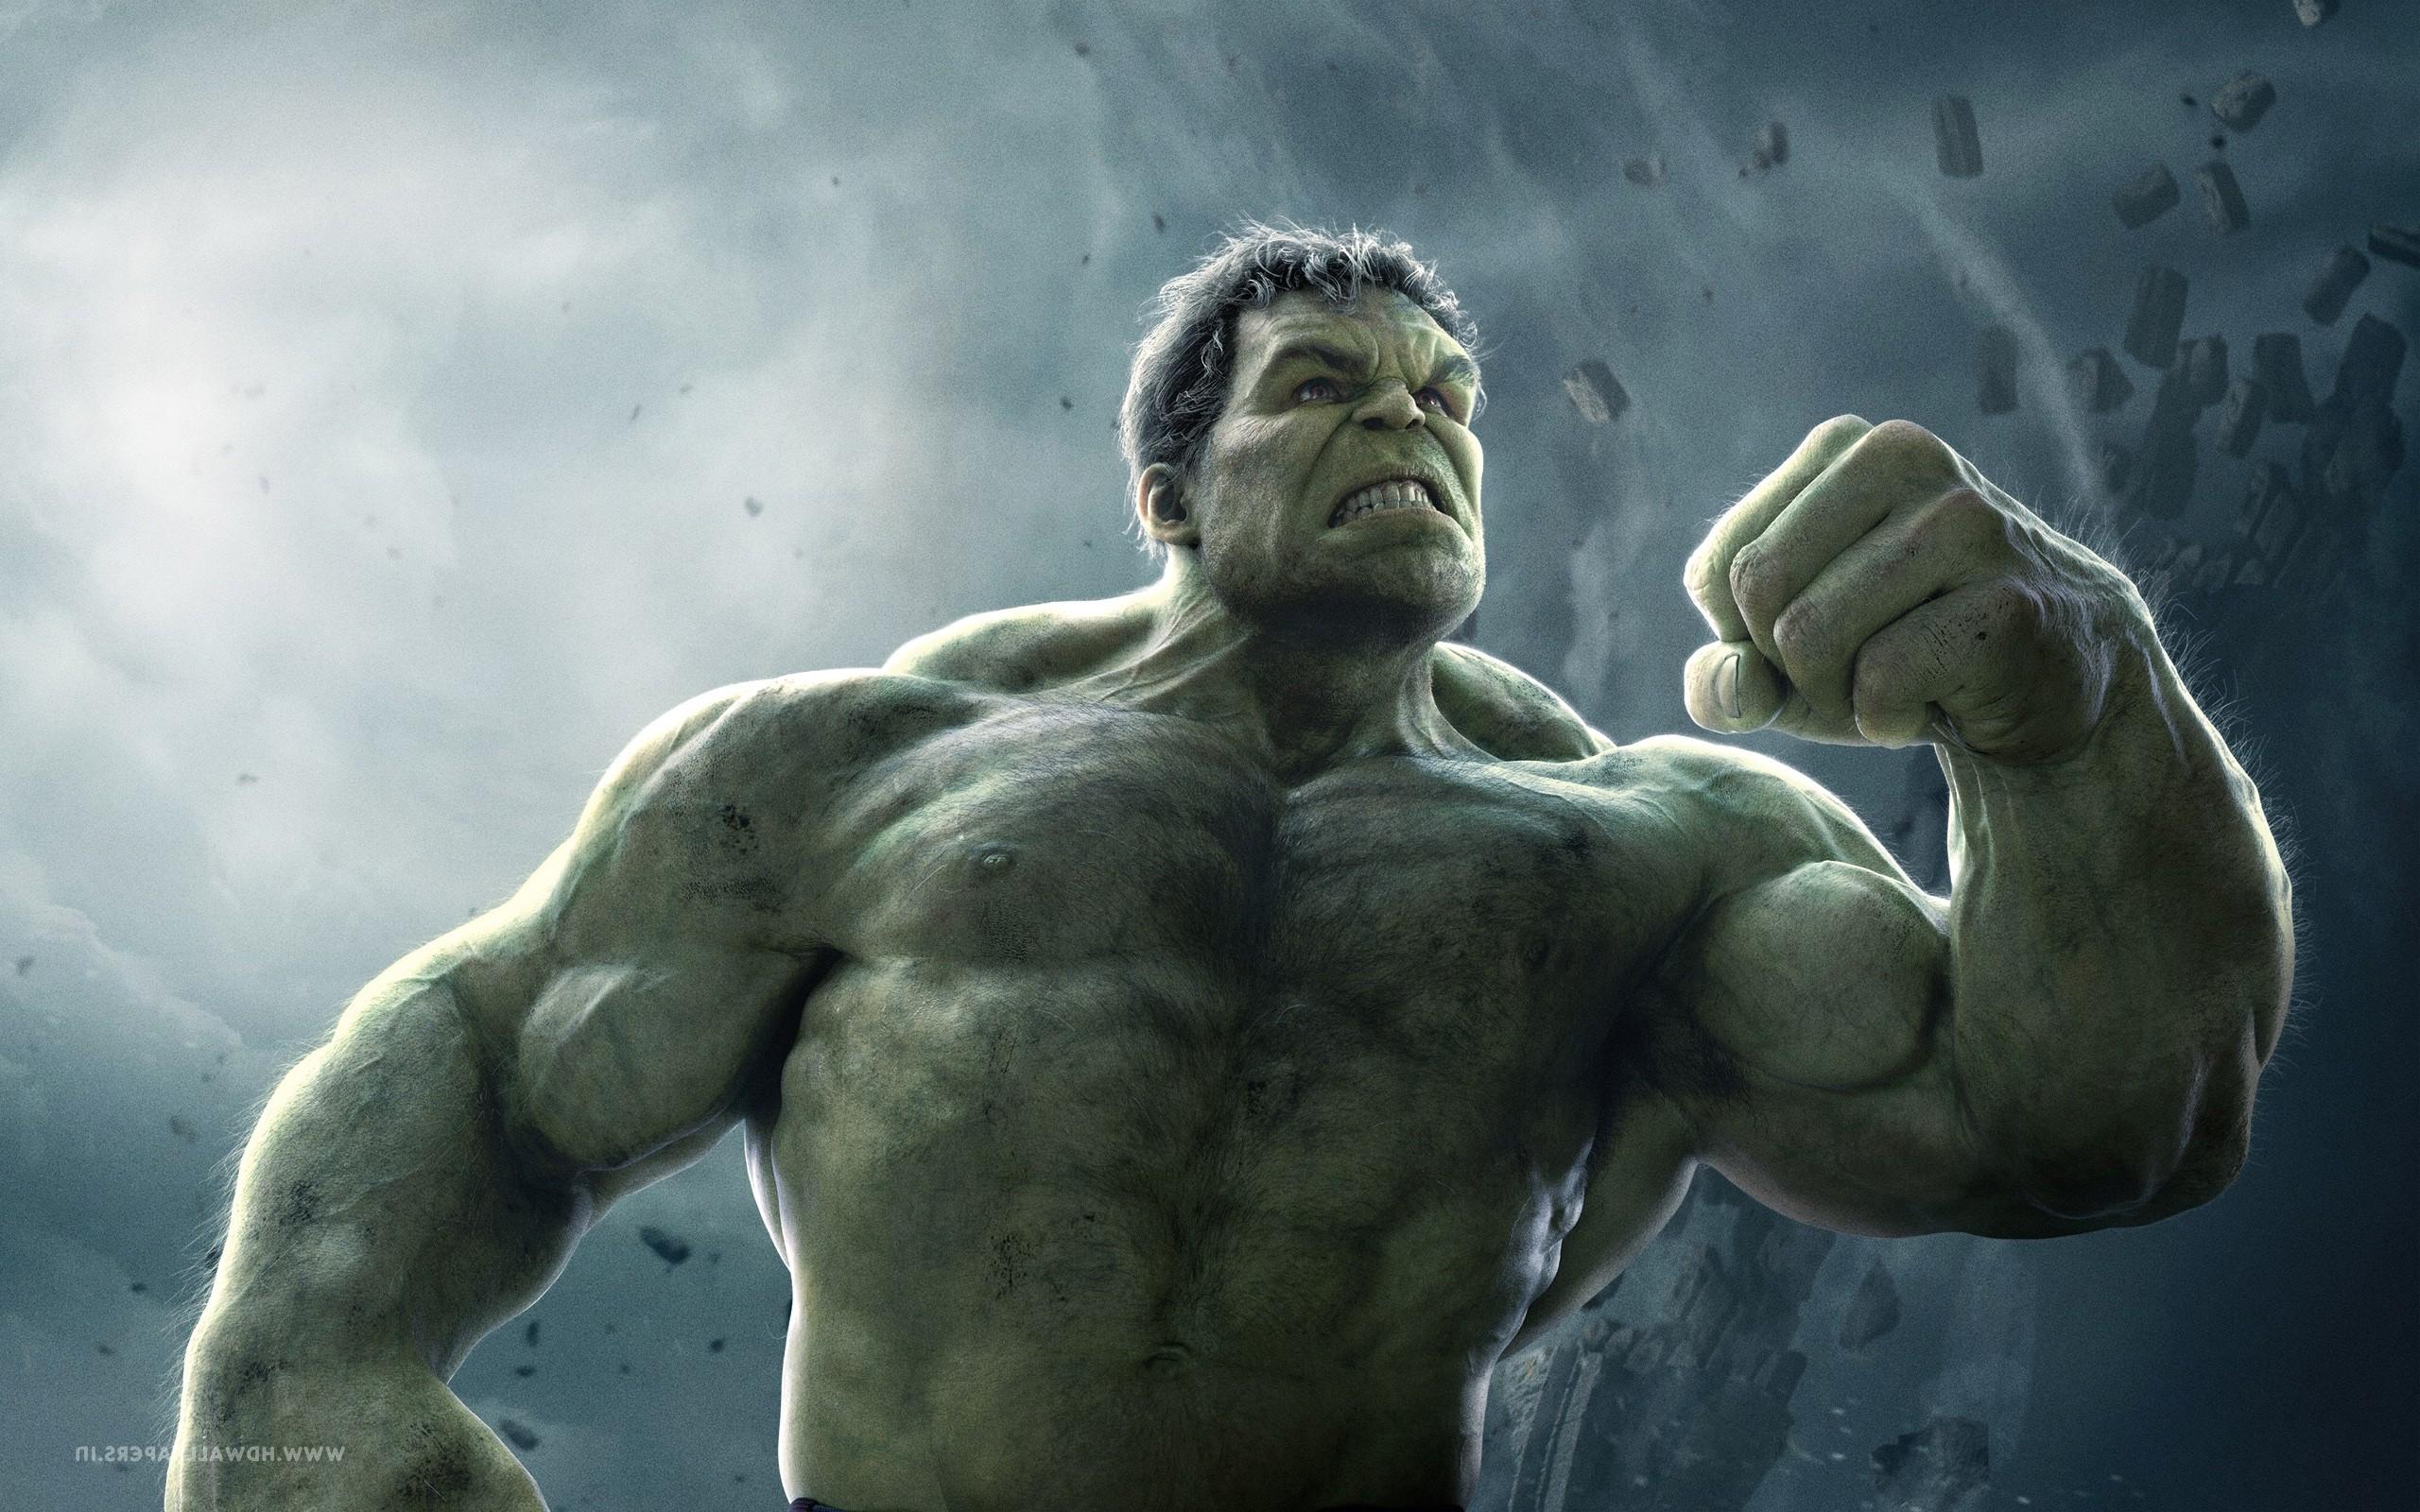 Hulk 3d Wallpaper Download 2048x1152 Hulk In Avengers Age Of Ultron 2048x1152